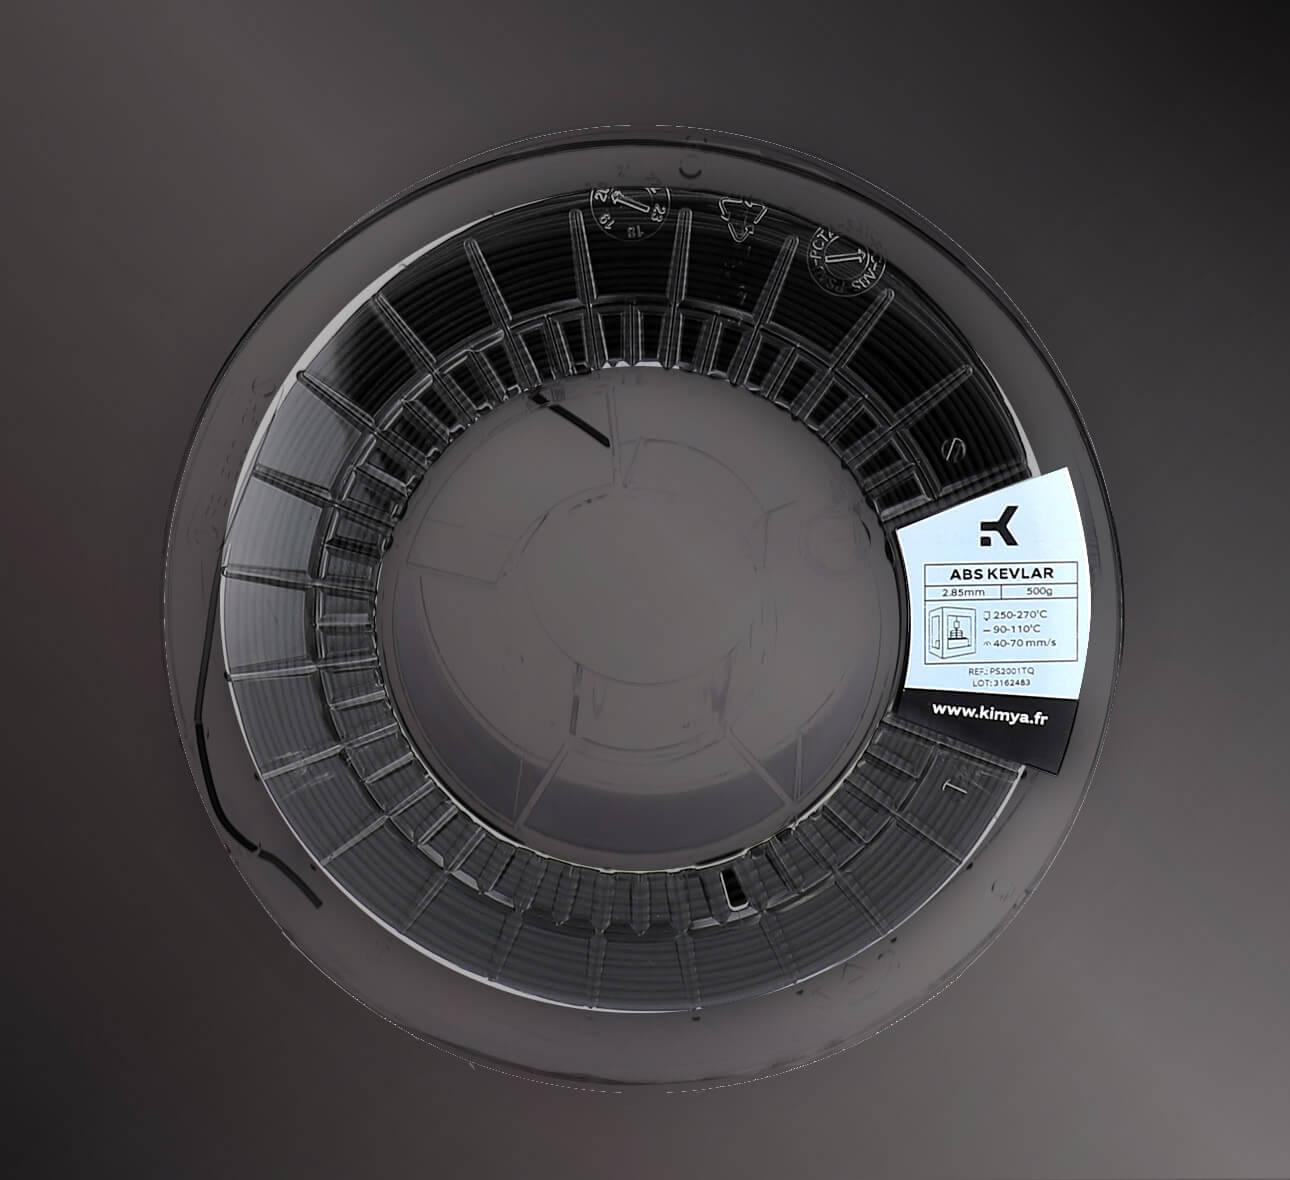 Kimya ABS Kevlar Material de impresión 3D